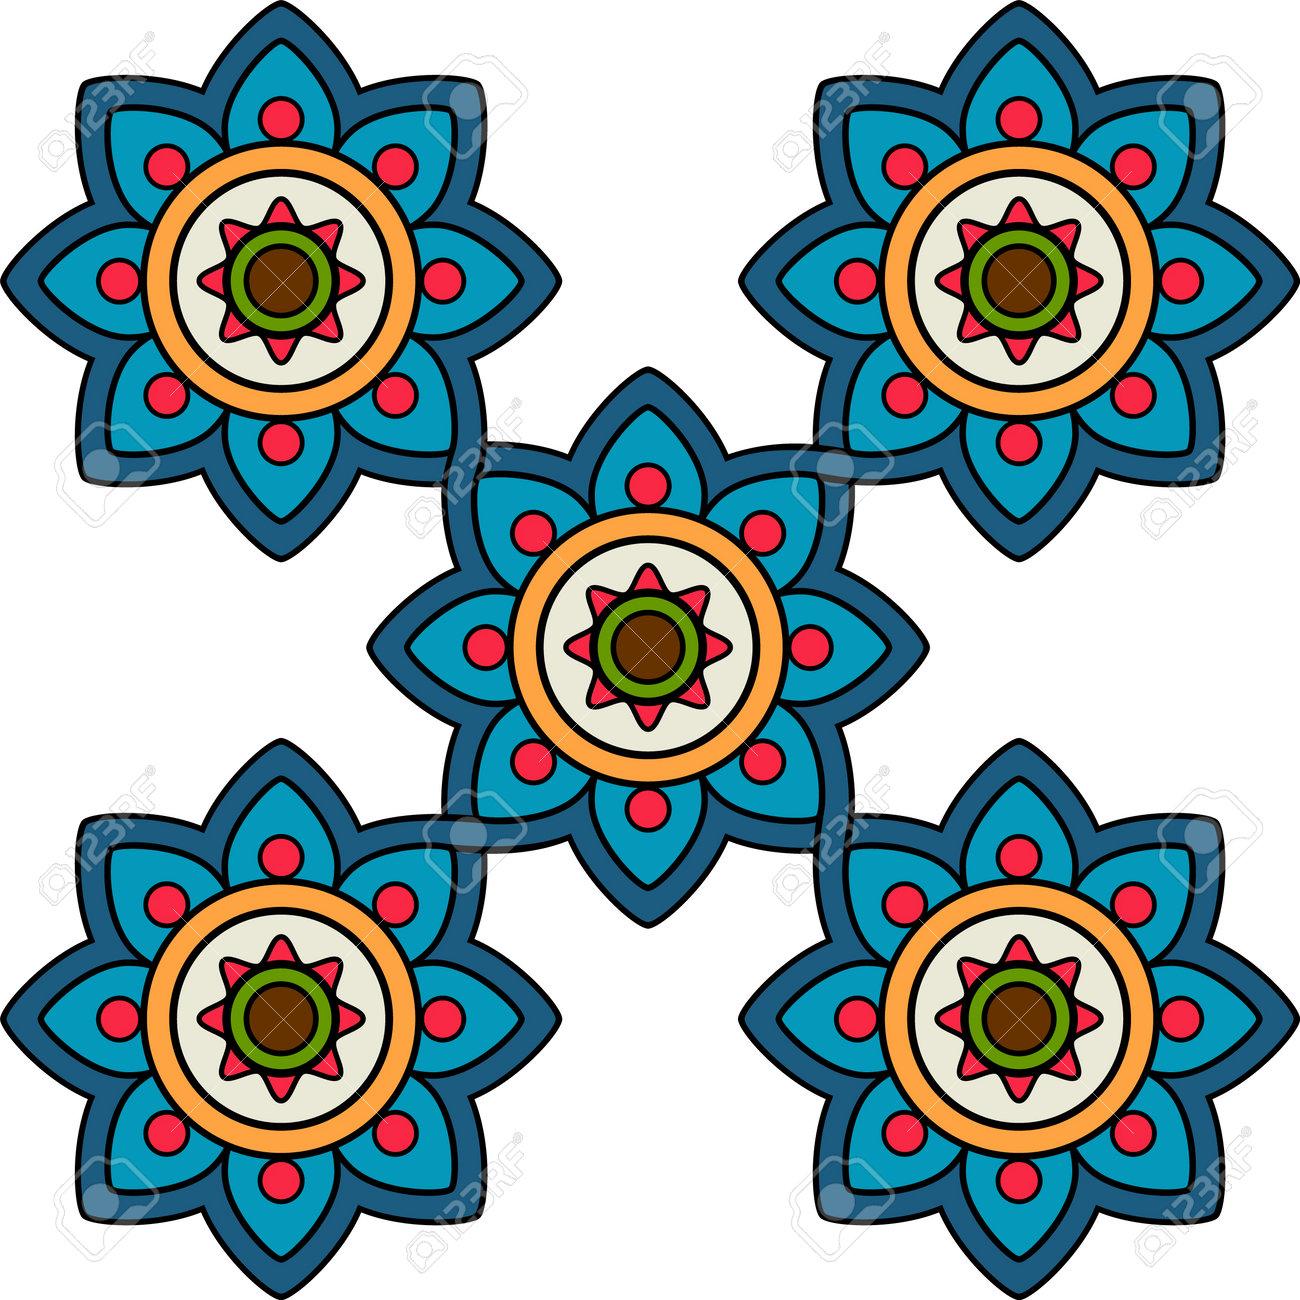 Decorative flower tile pattern geometric mosaic moroccan ceramic ornament - 171052323